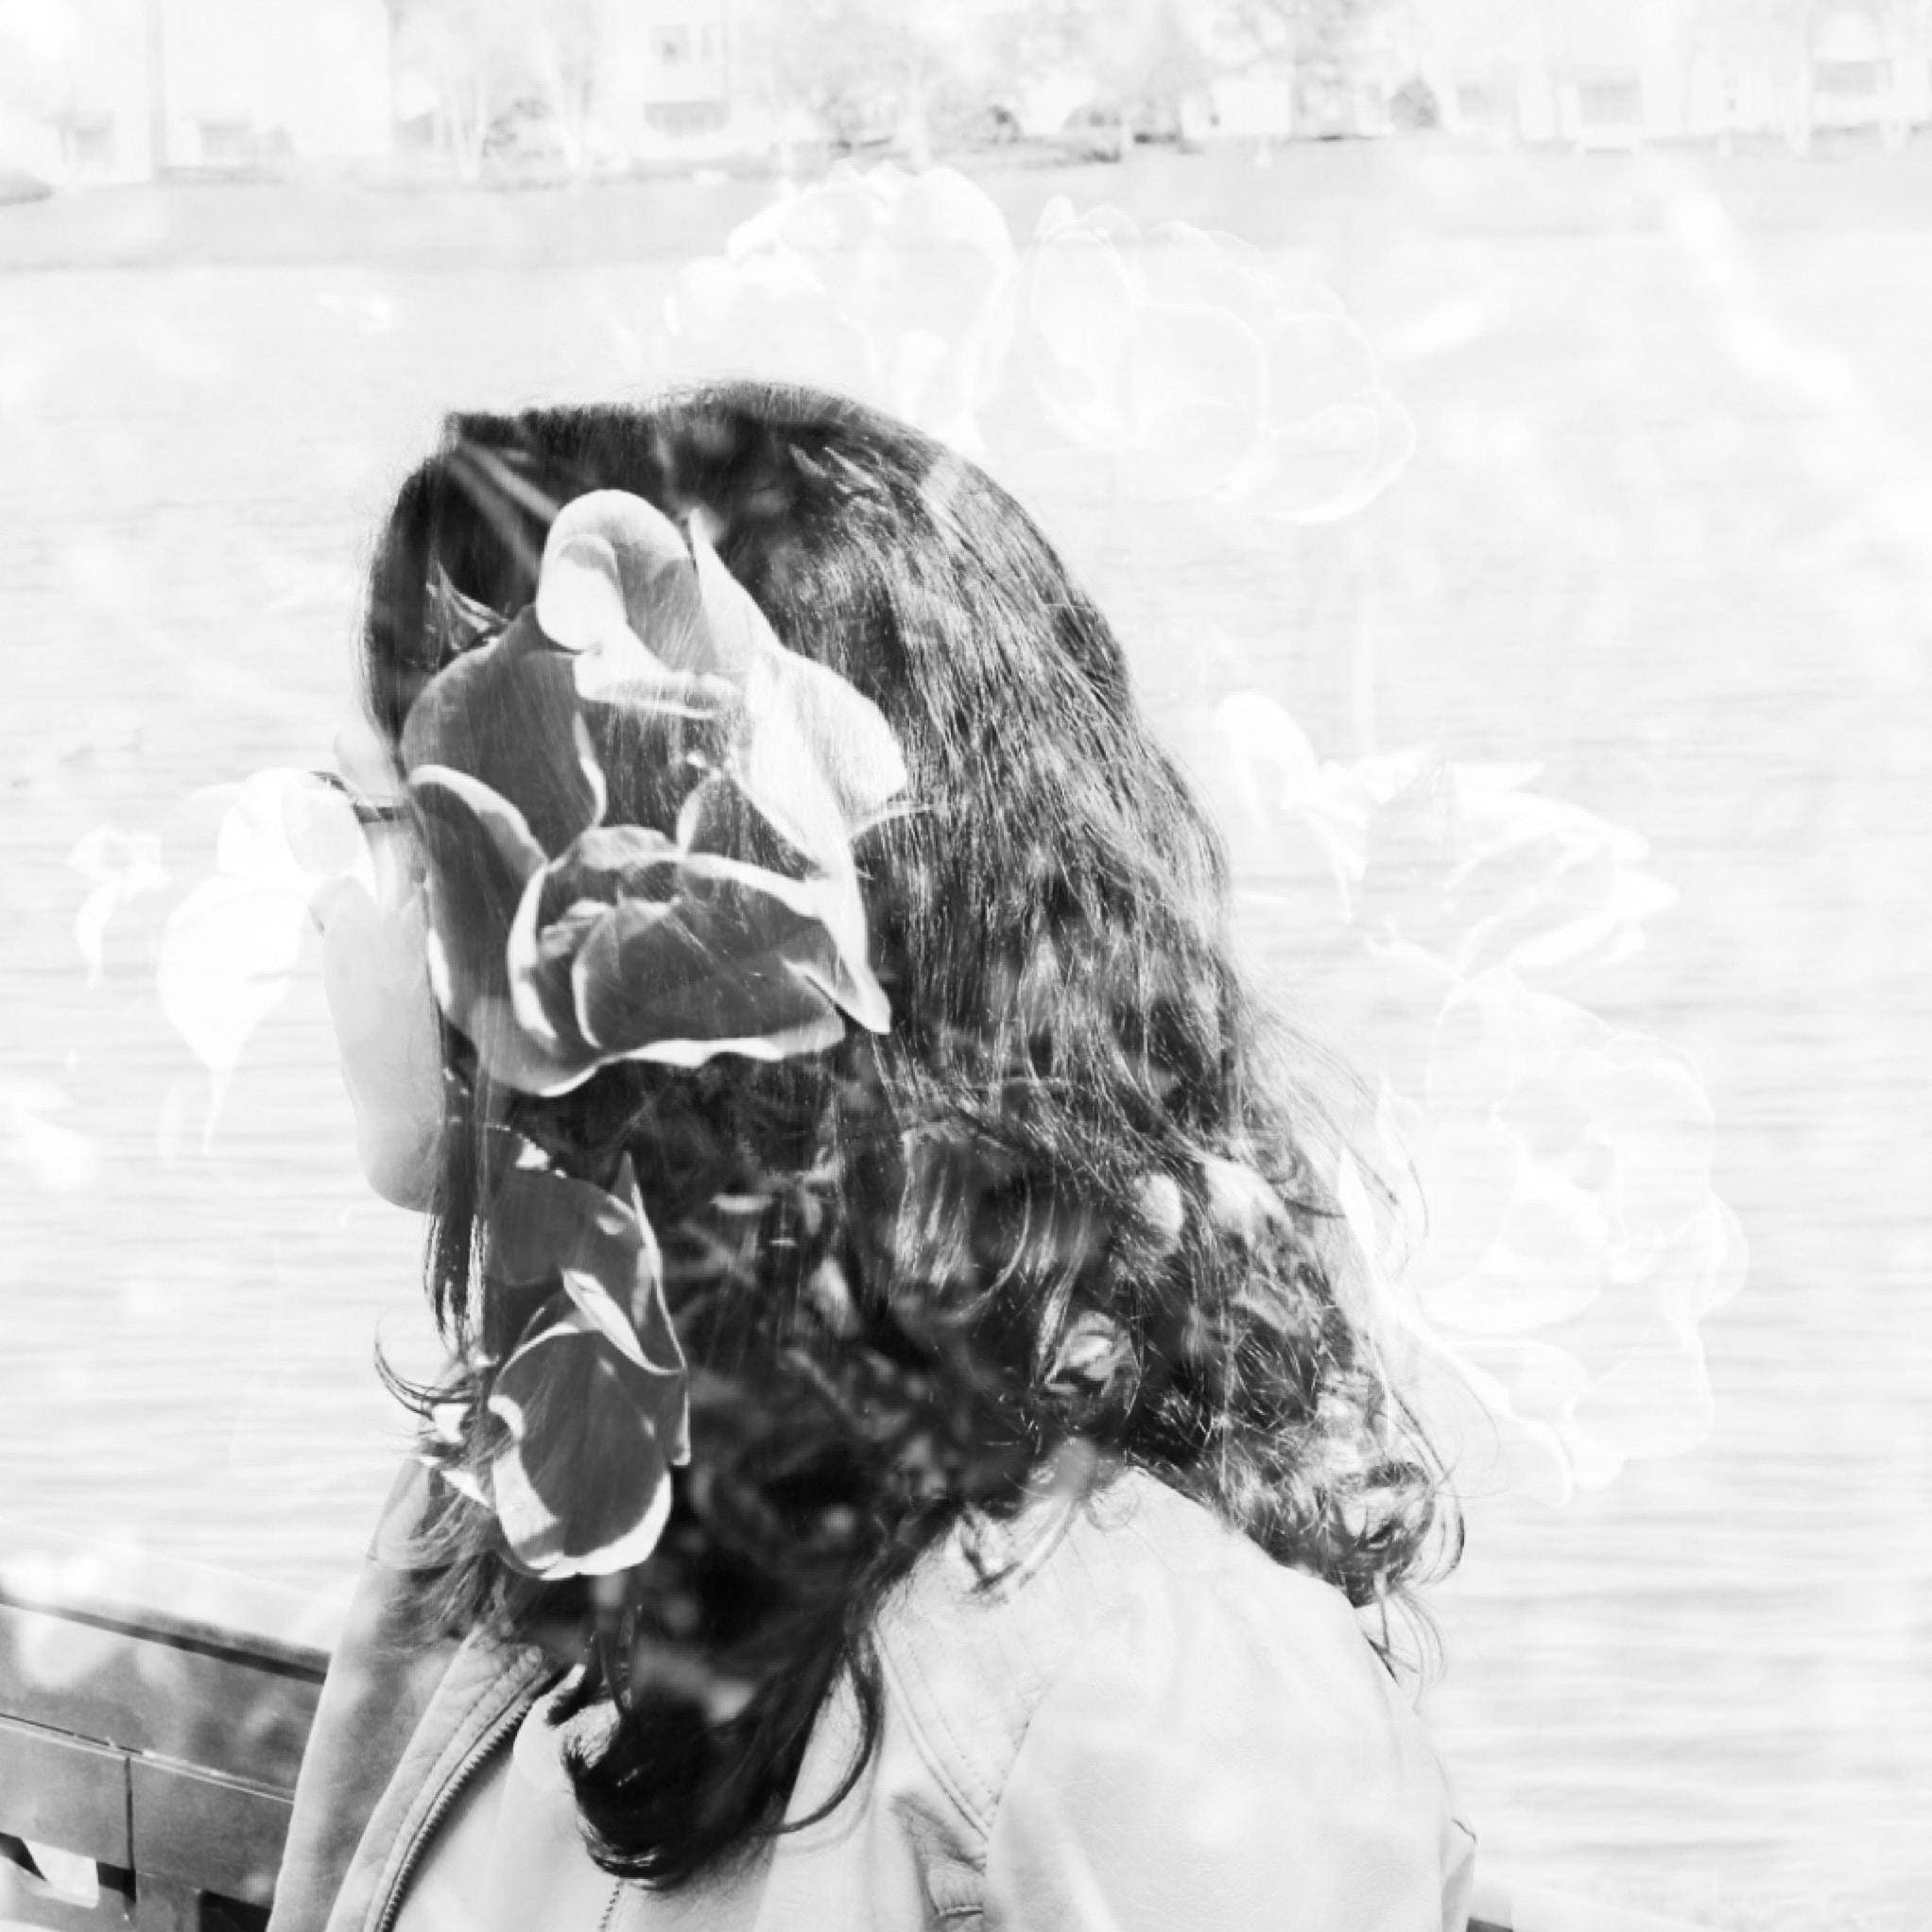 Go to Gabrielle Rocha Rios's profile